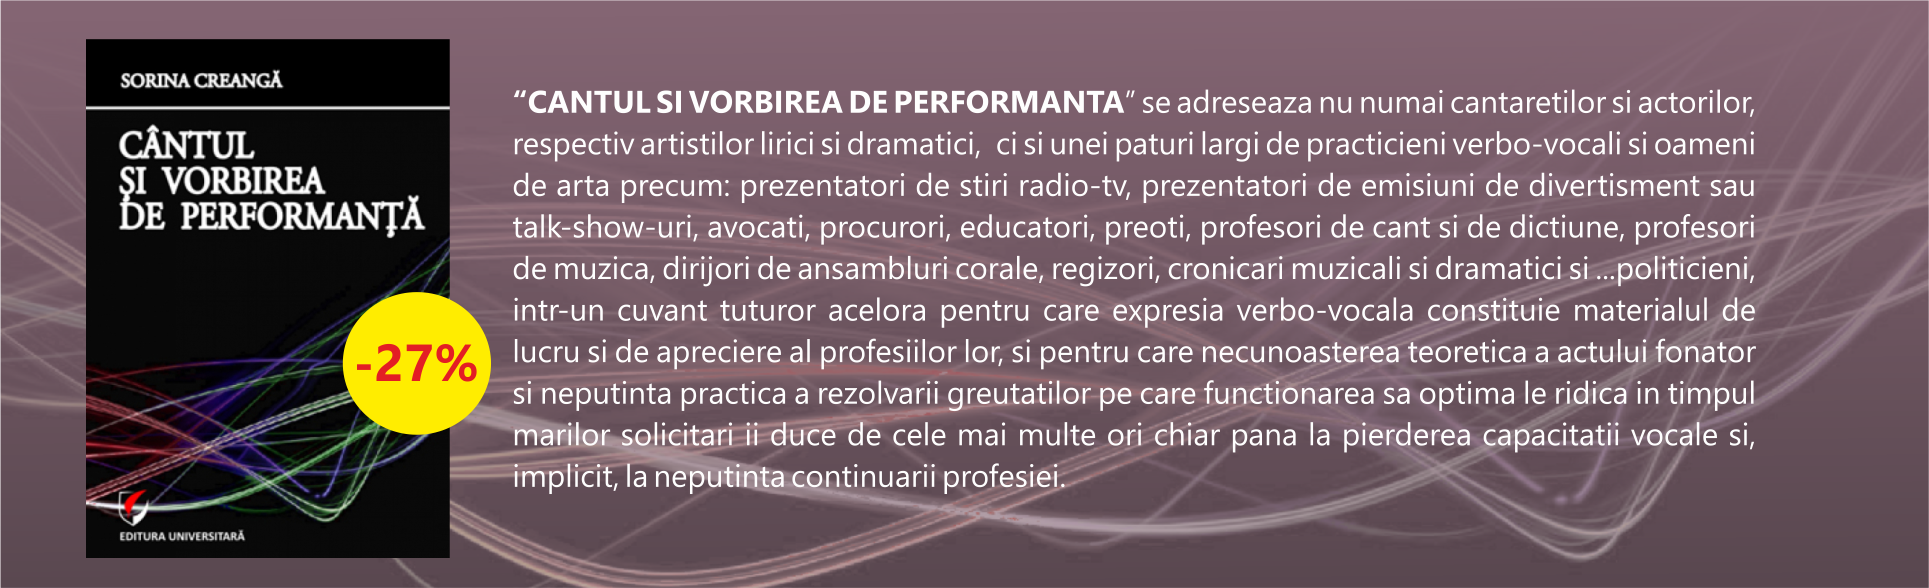 Homepage_14_Cantul si vorbirea